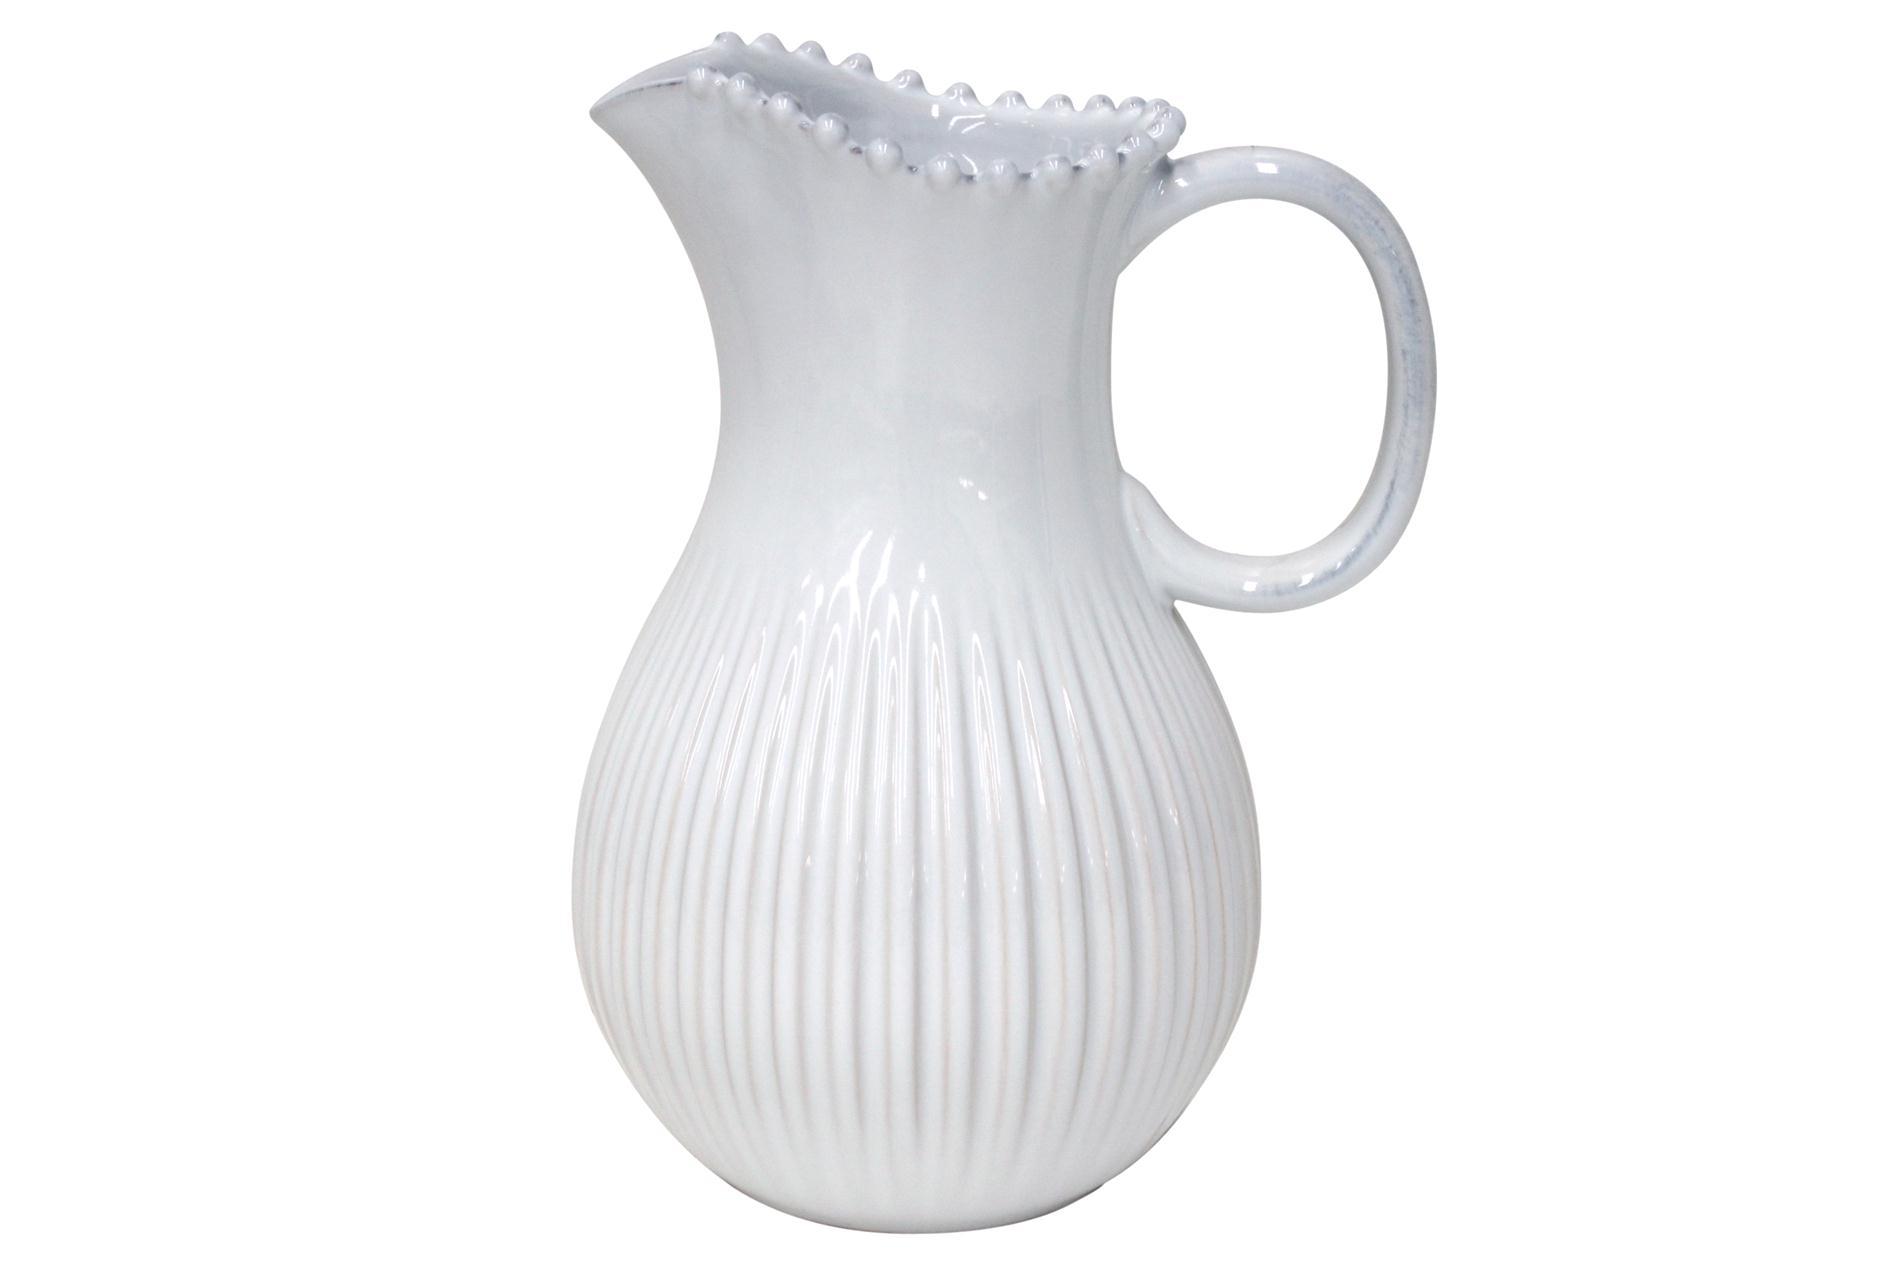 Krug Pearl weiß, 2,9 l